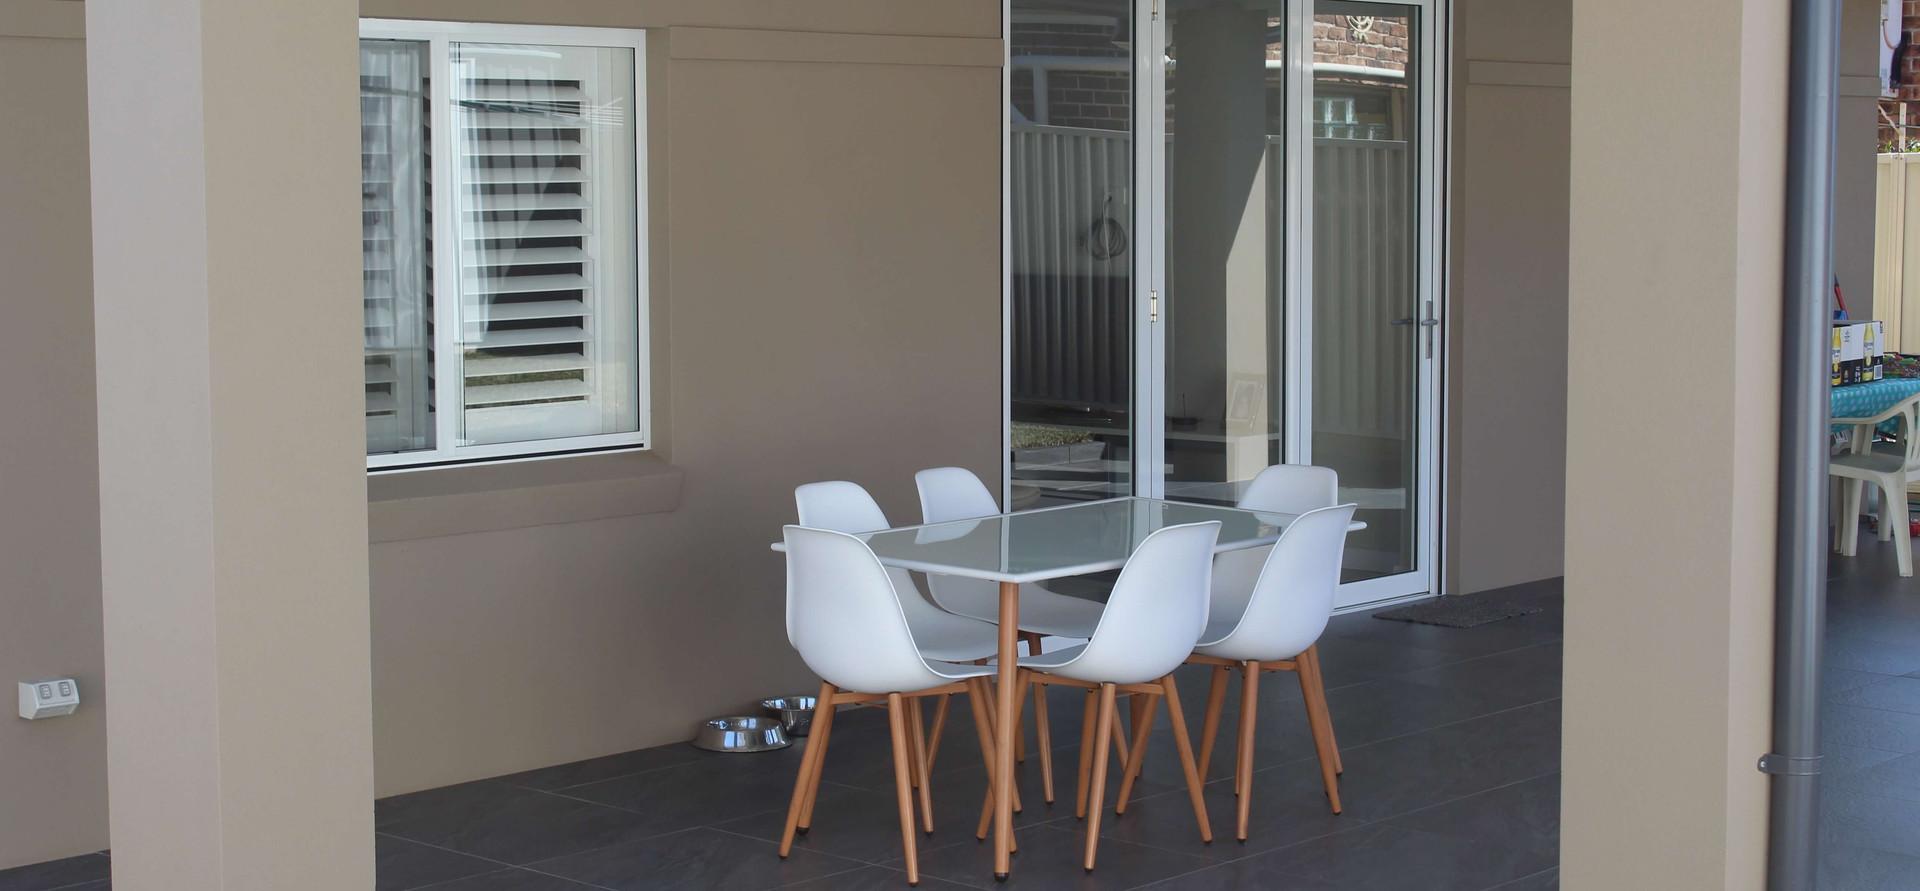 sydney extensions - quality builder Conc